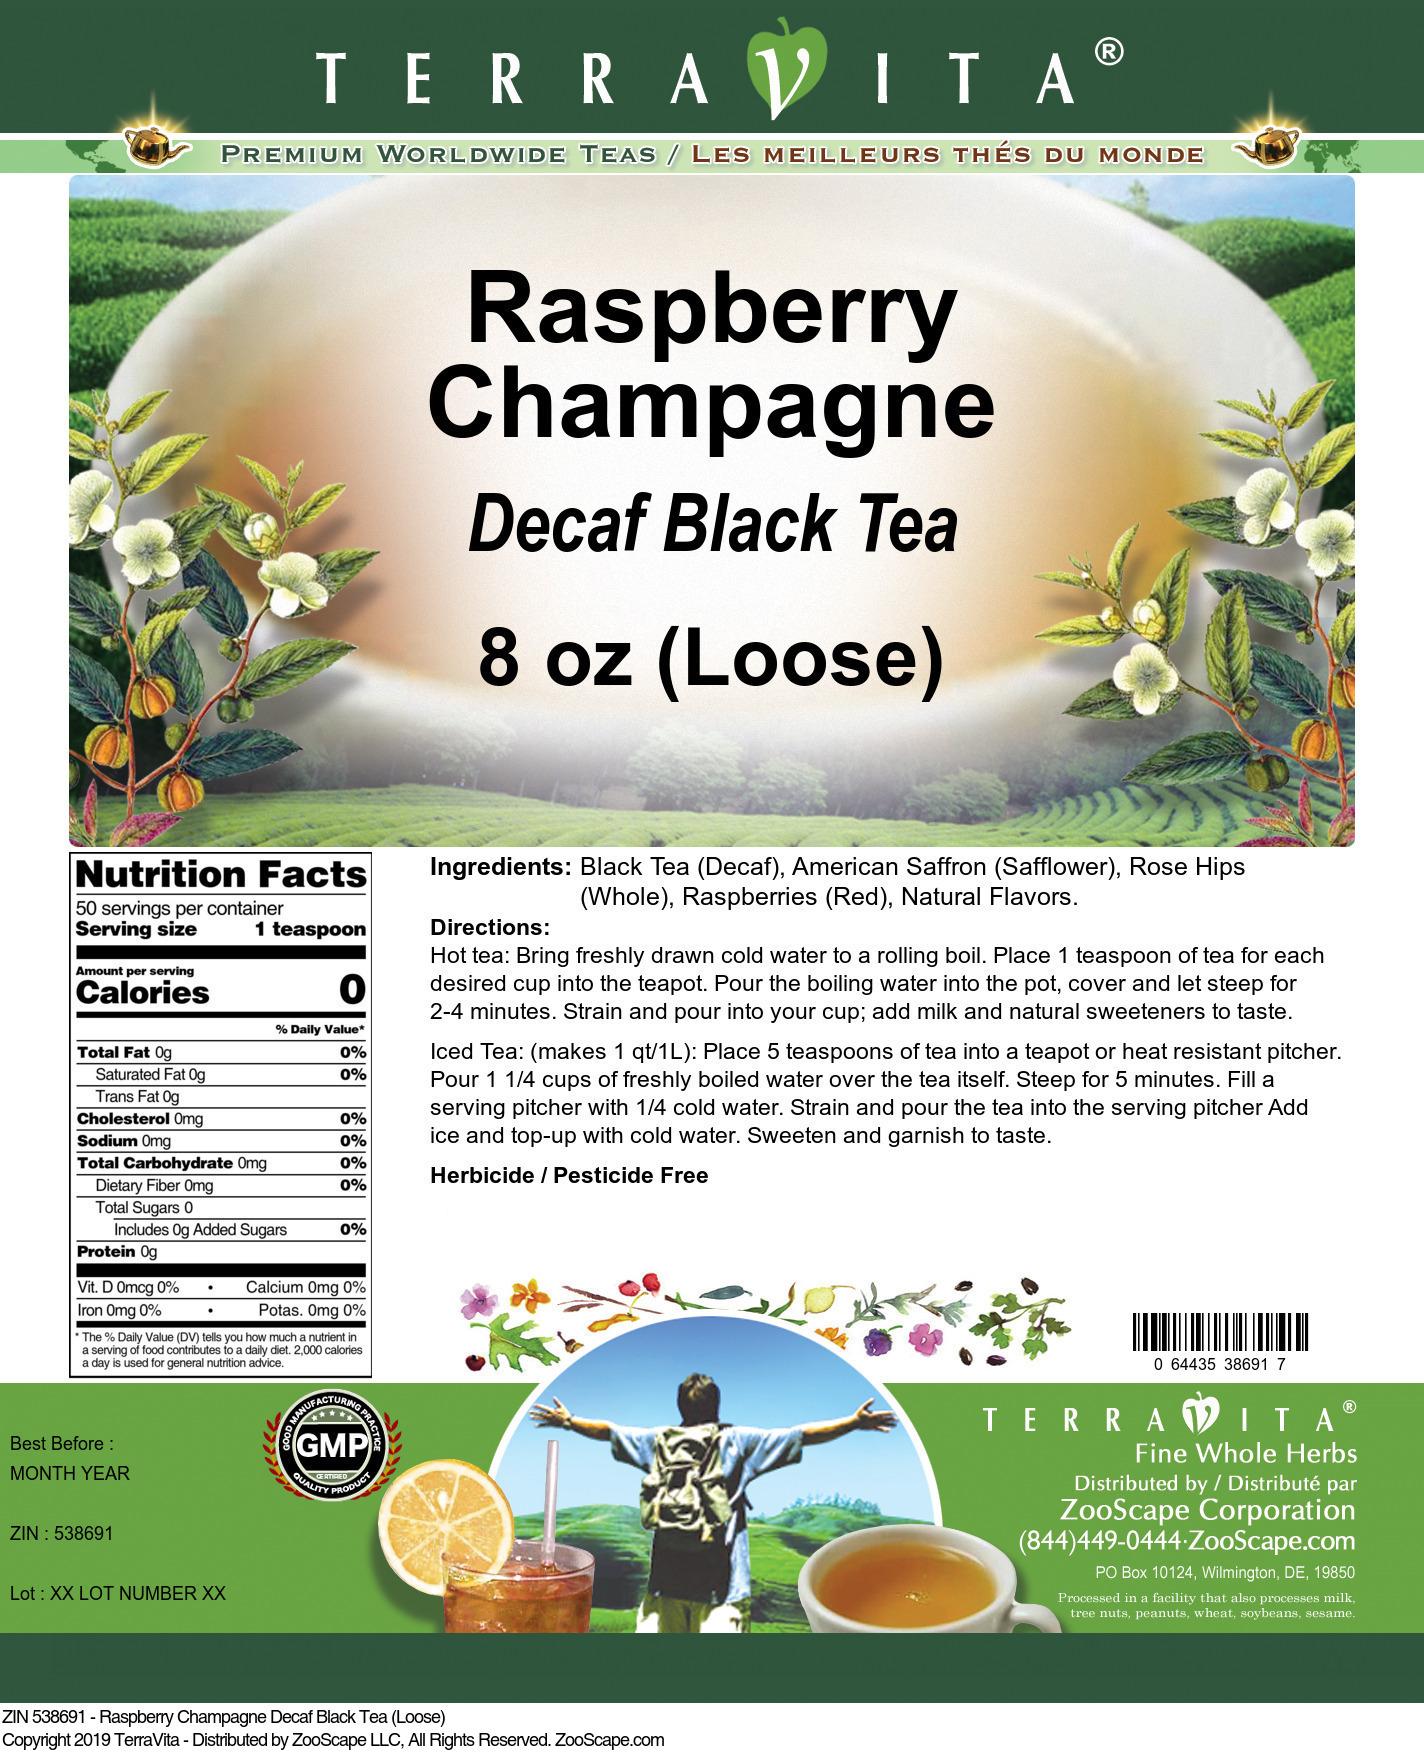 Raspberry Champagne Decaf Black Tea (Loose)